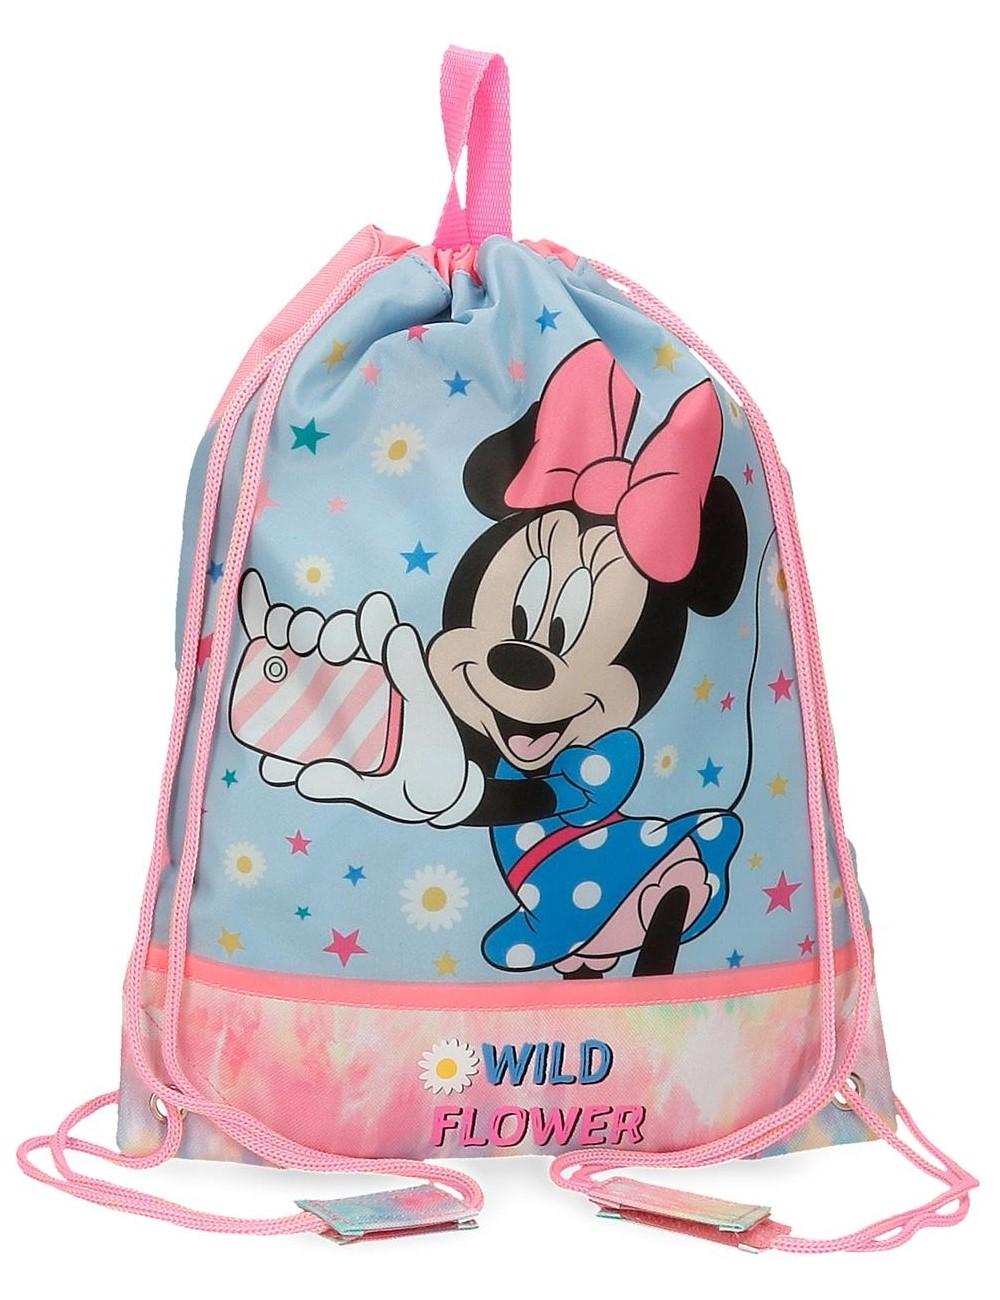 Bolsa Merienda Minnie Wild Flower 4423721